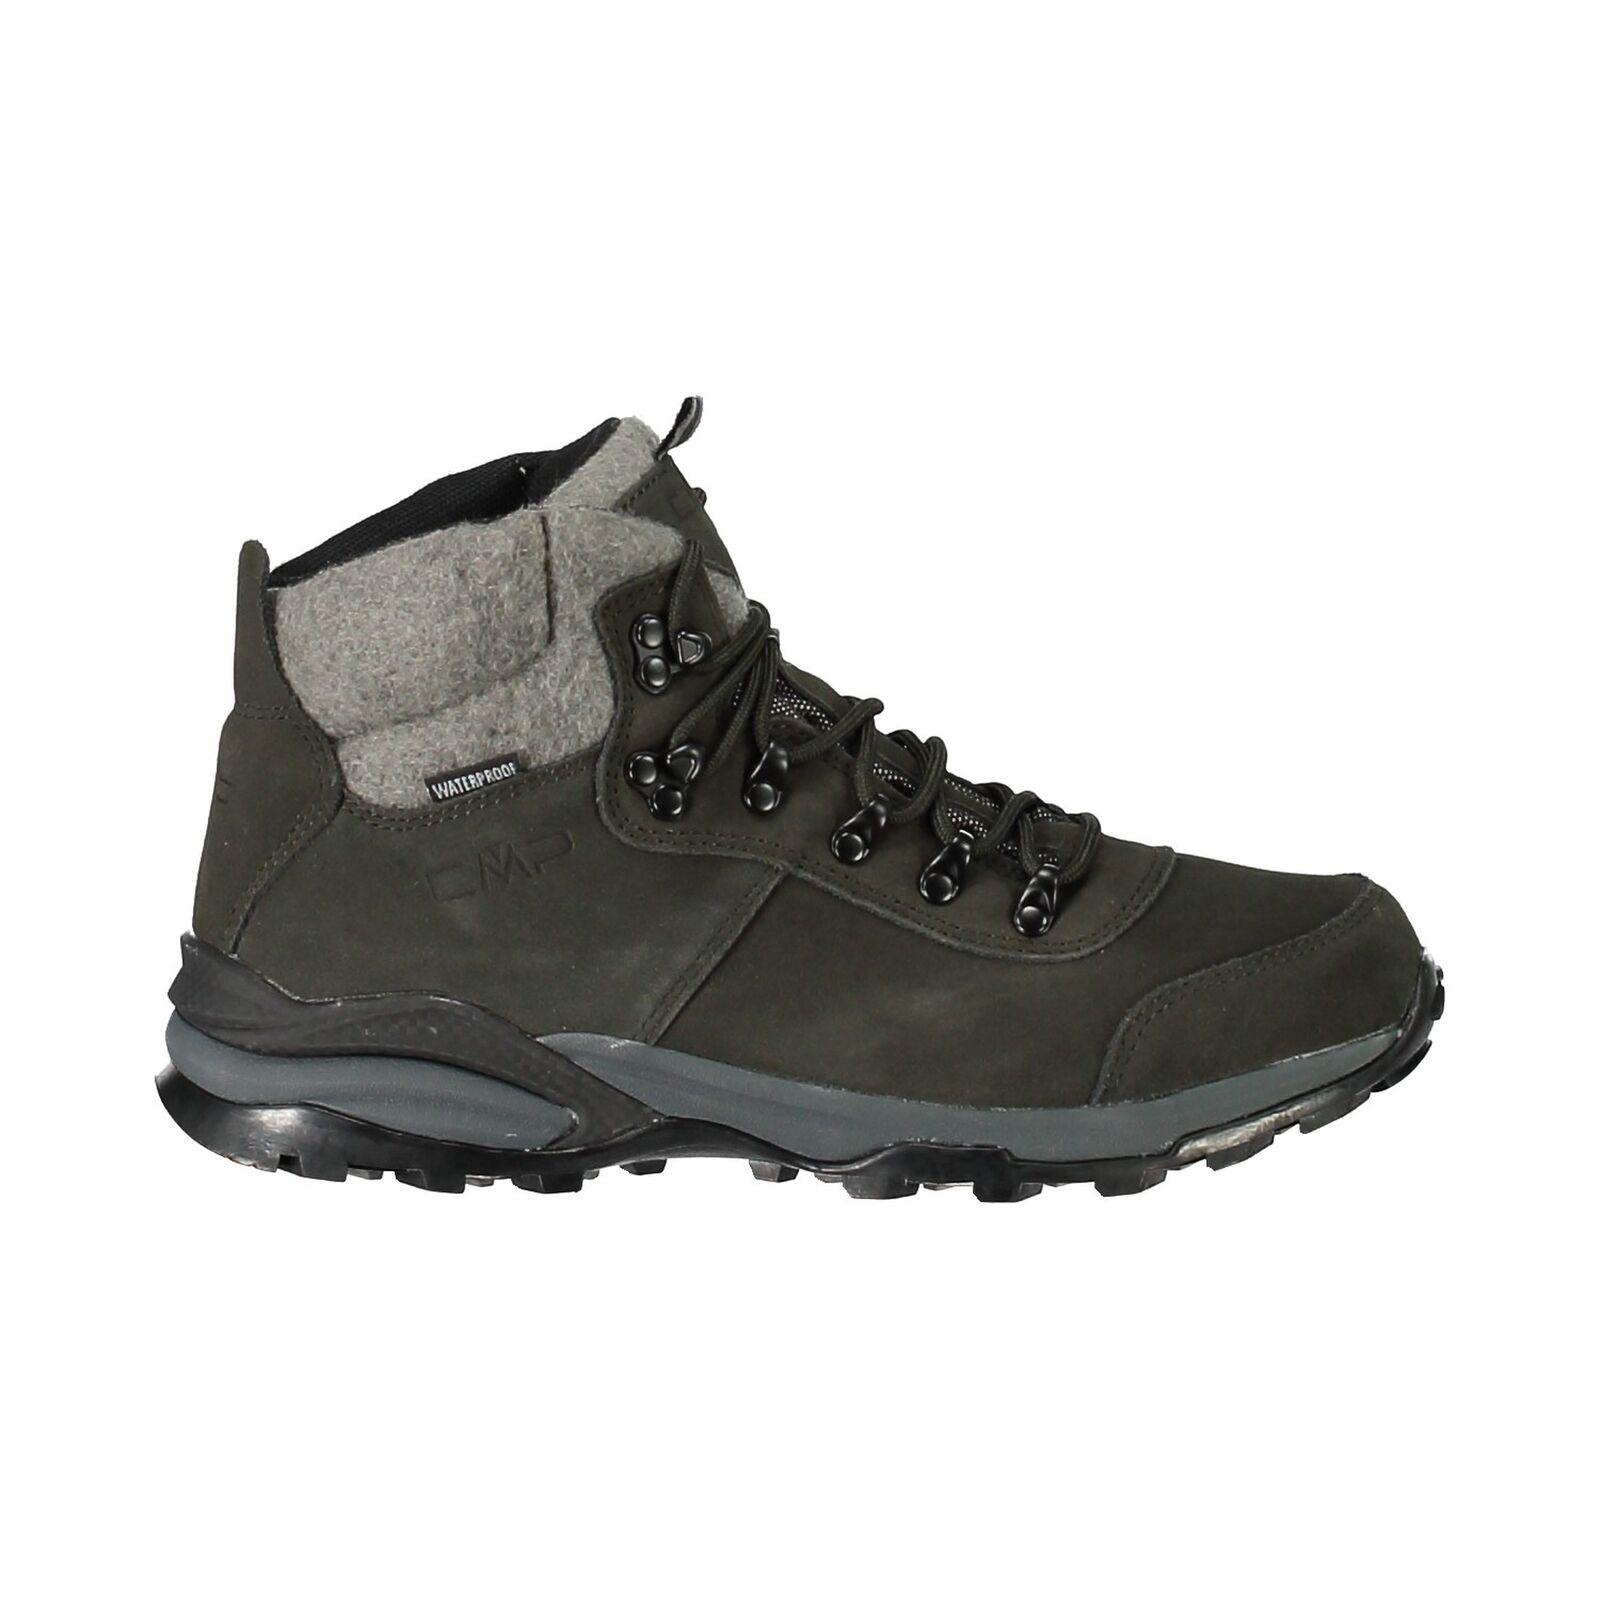 CMP chaussures da Trekking chaussures Tempo Libero Turais Trekking chaussures Wp 2.0 Pianura